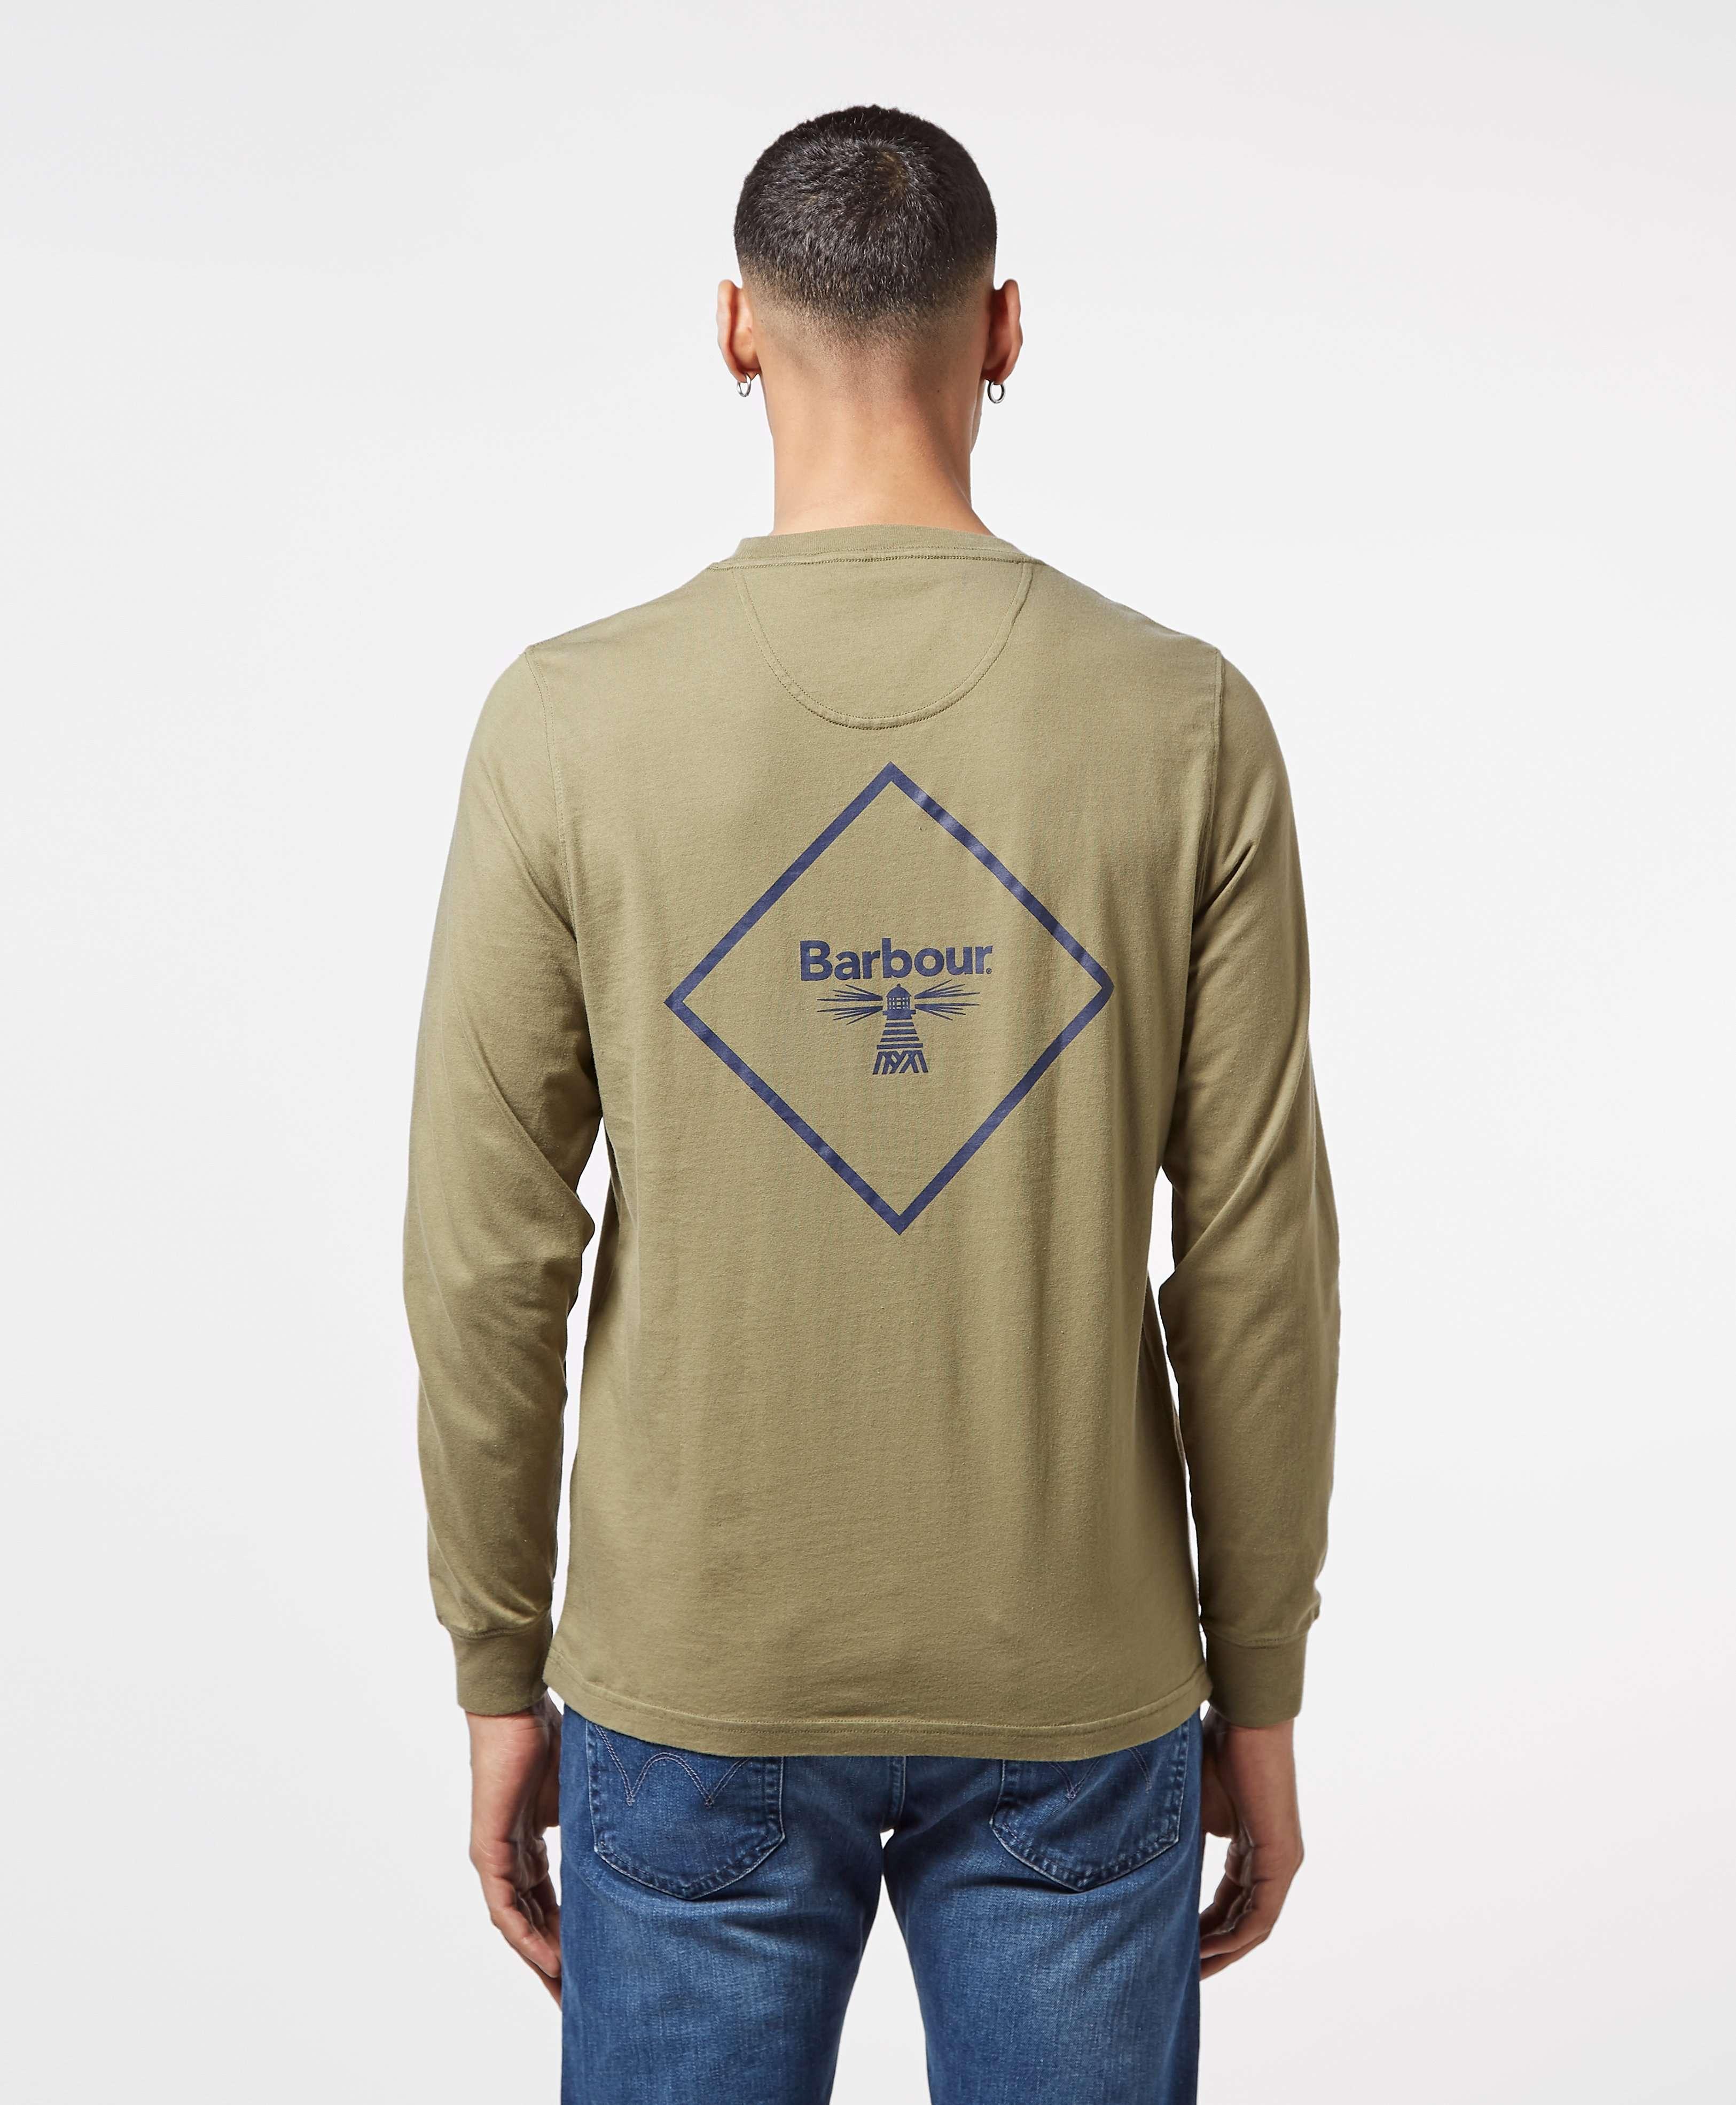 Barbour Beacon Long Sleeve Back Print T-Shirt